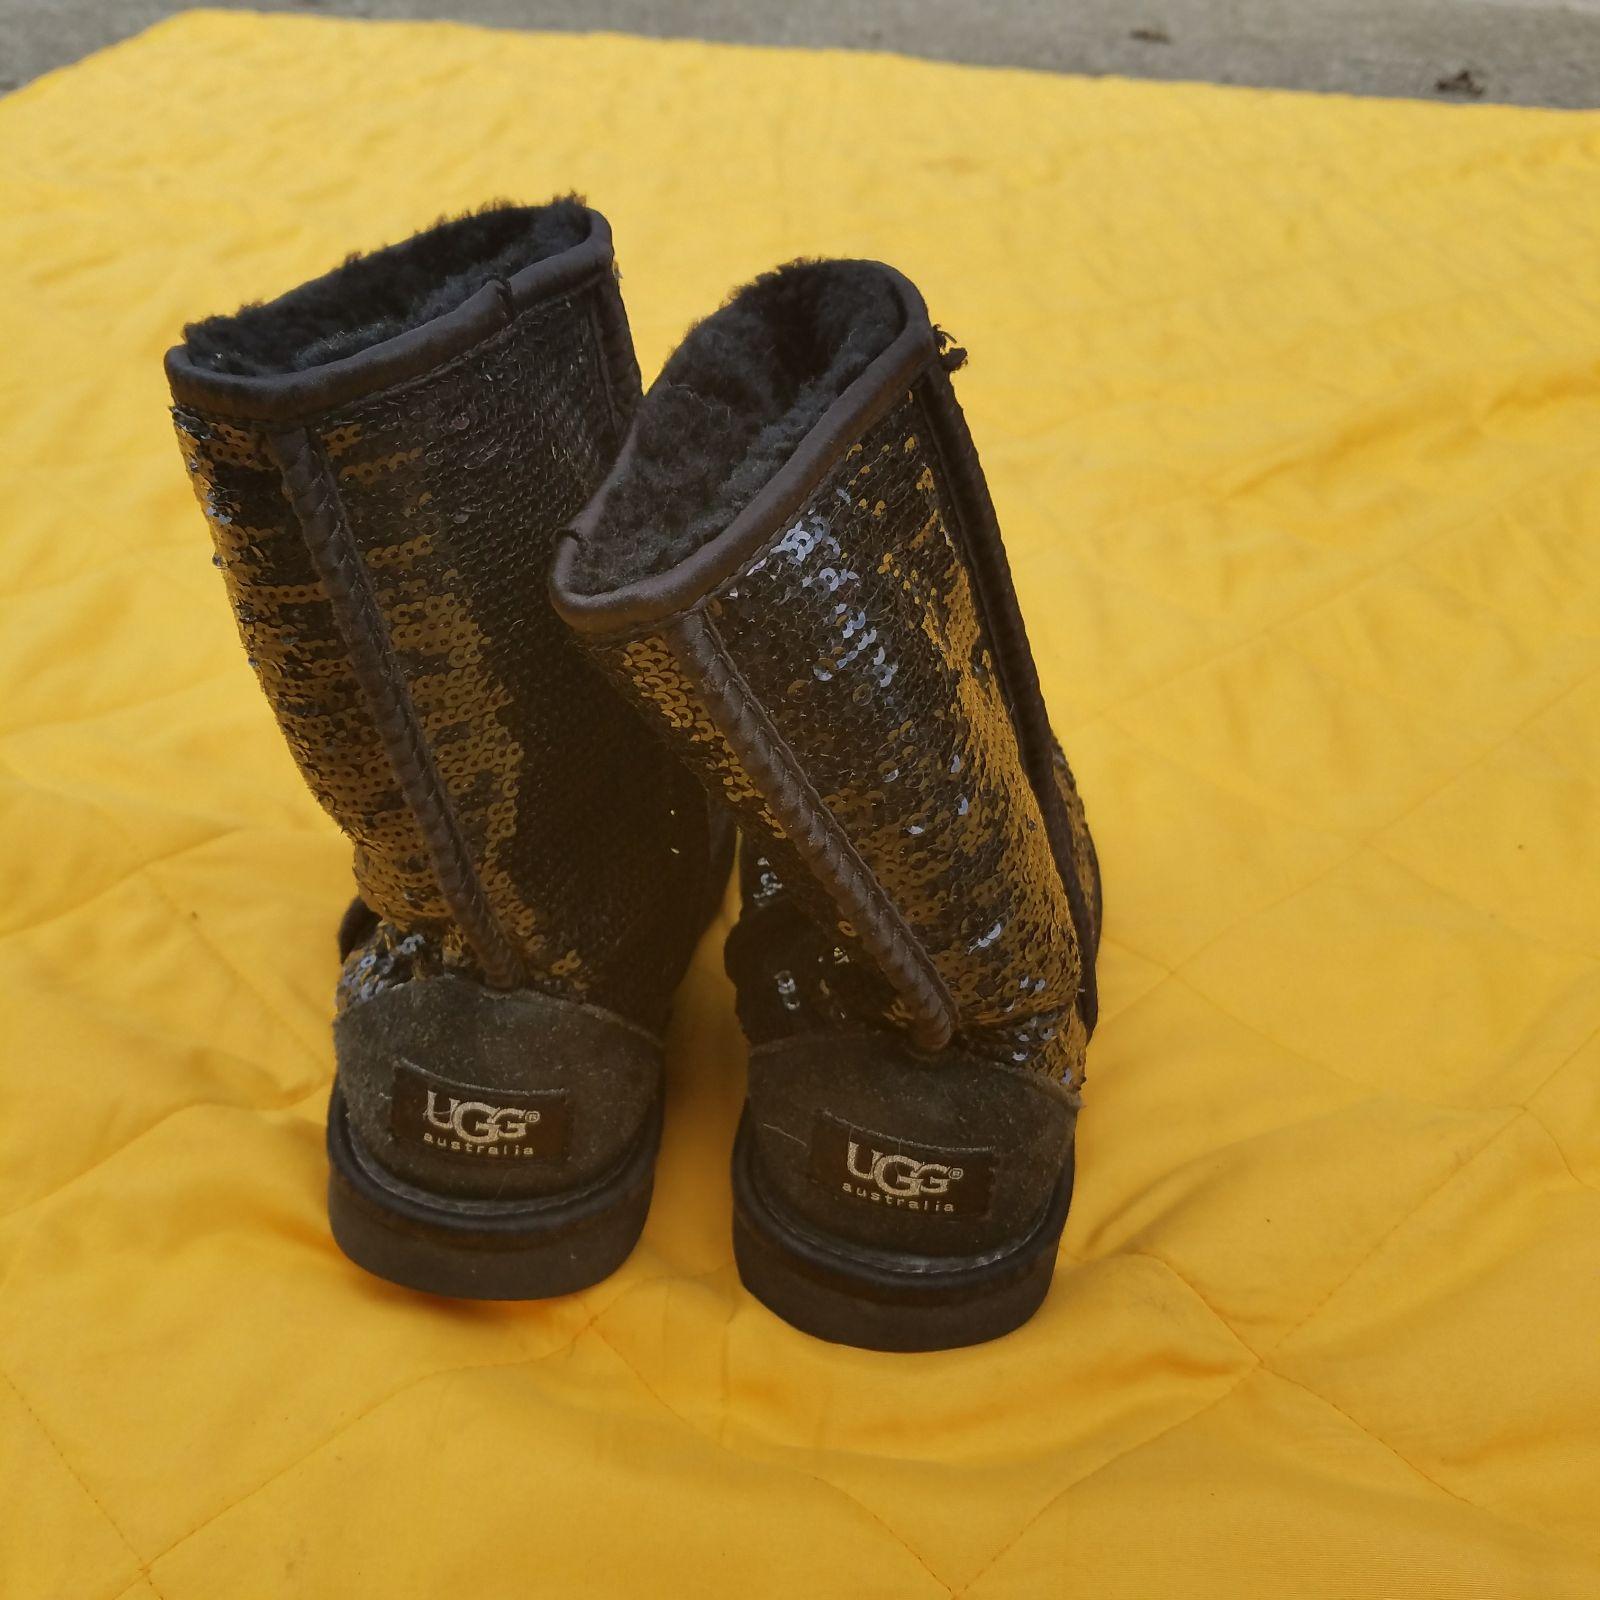 301051cccb9 Black sparkle uggs UGGS black sparkle size 6 - Mercari: BUY & SELL ...